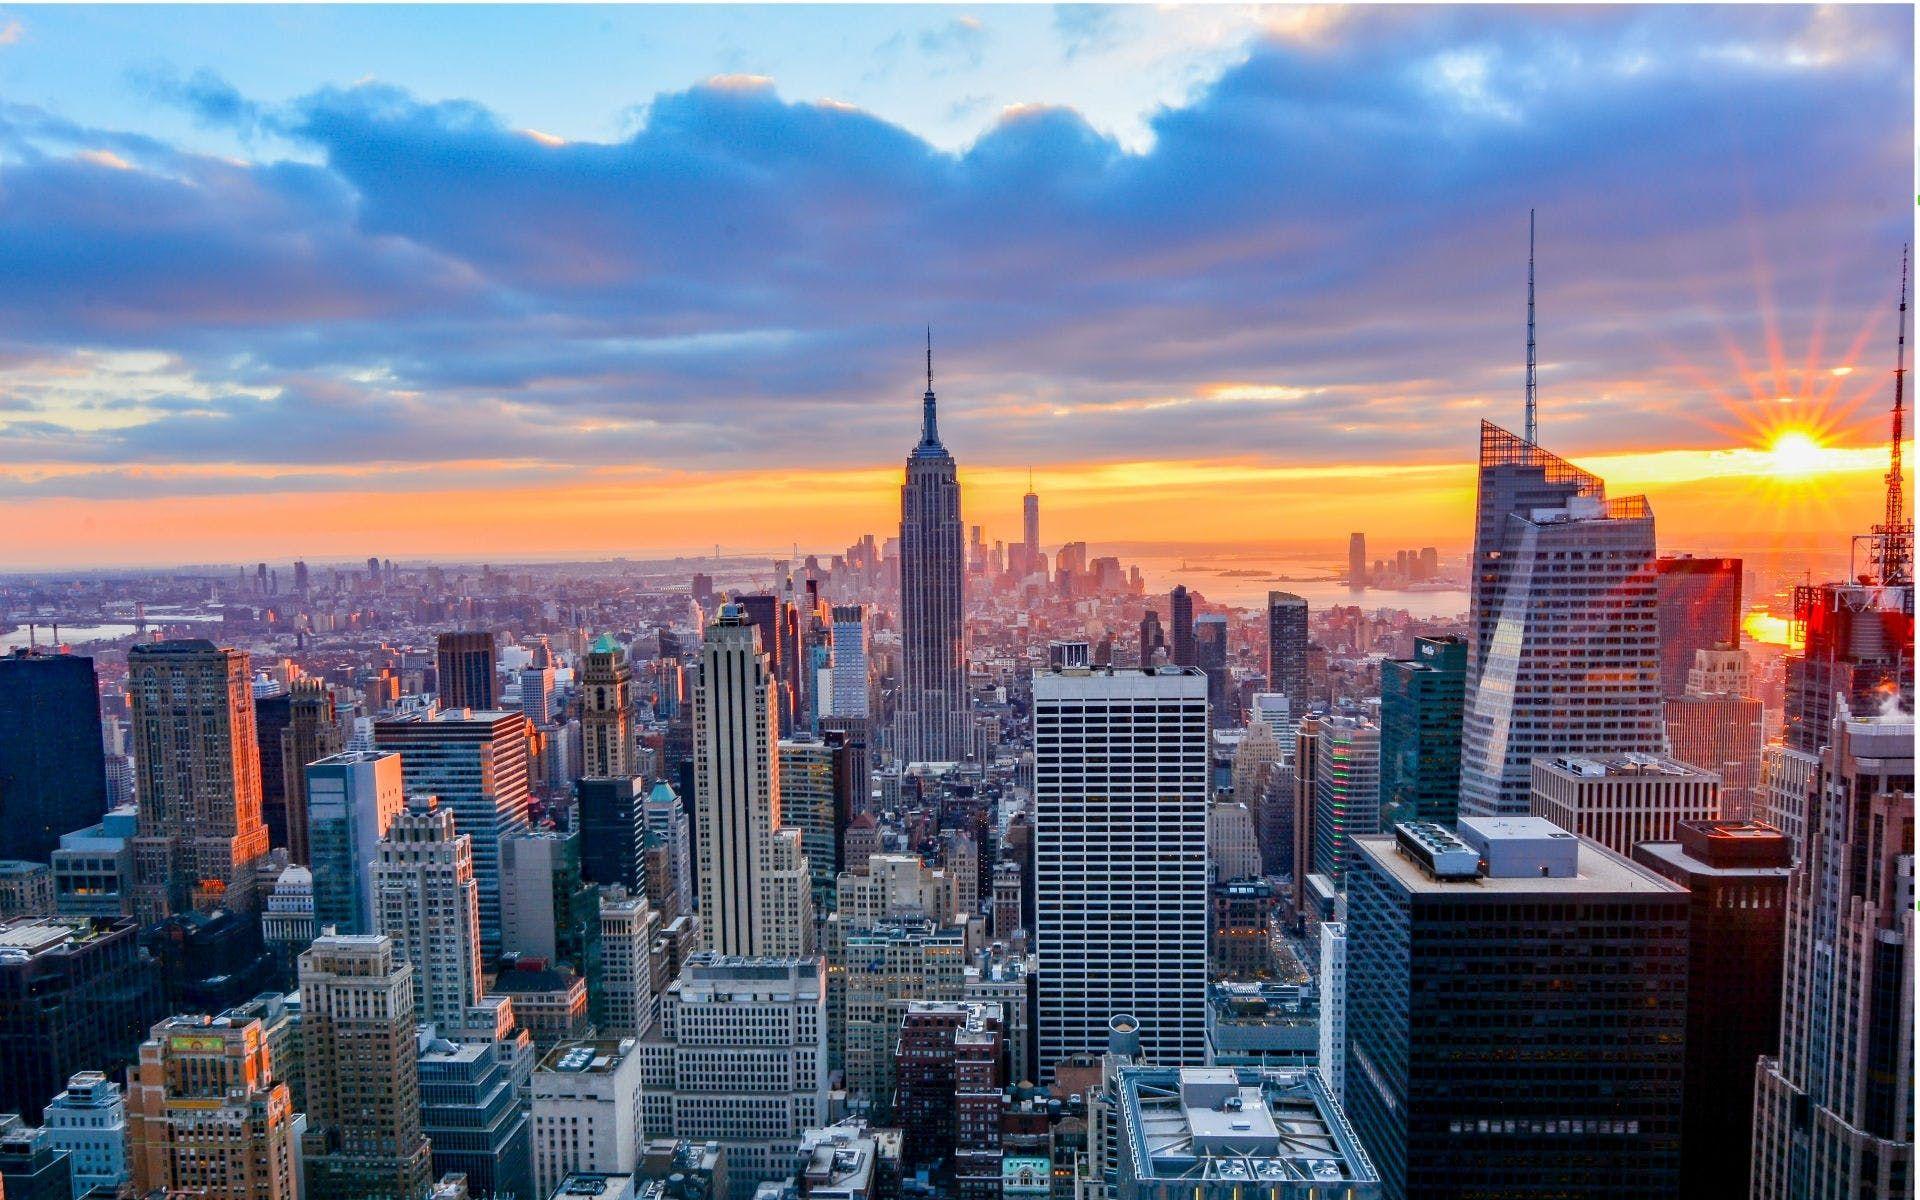 New york city at day19201200 beau paysage paysage